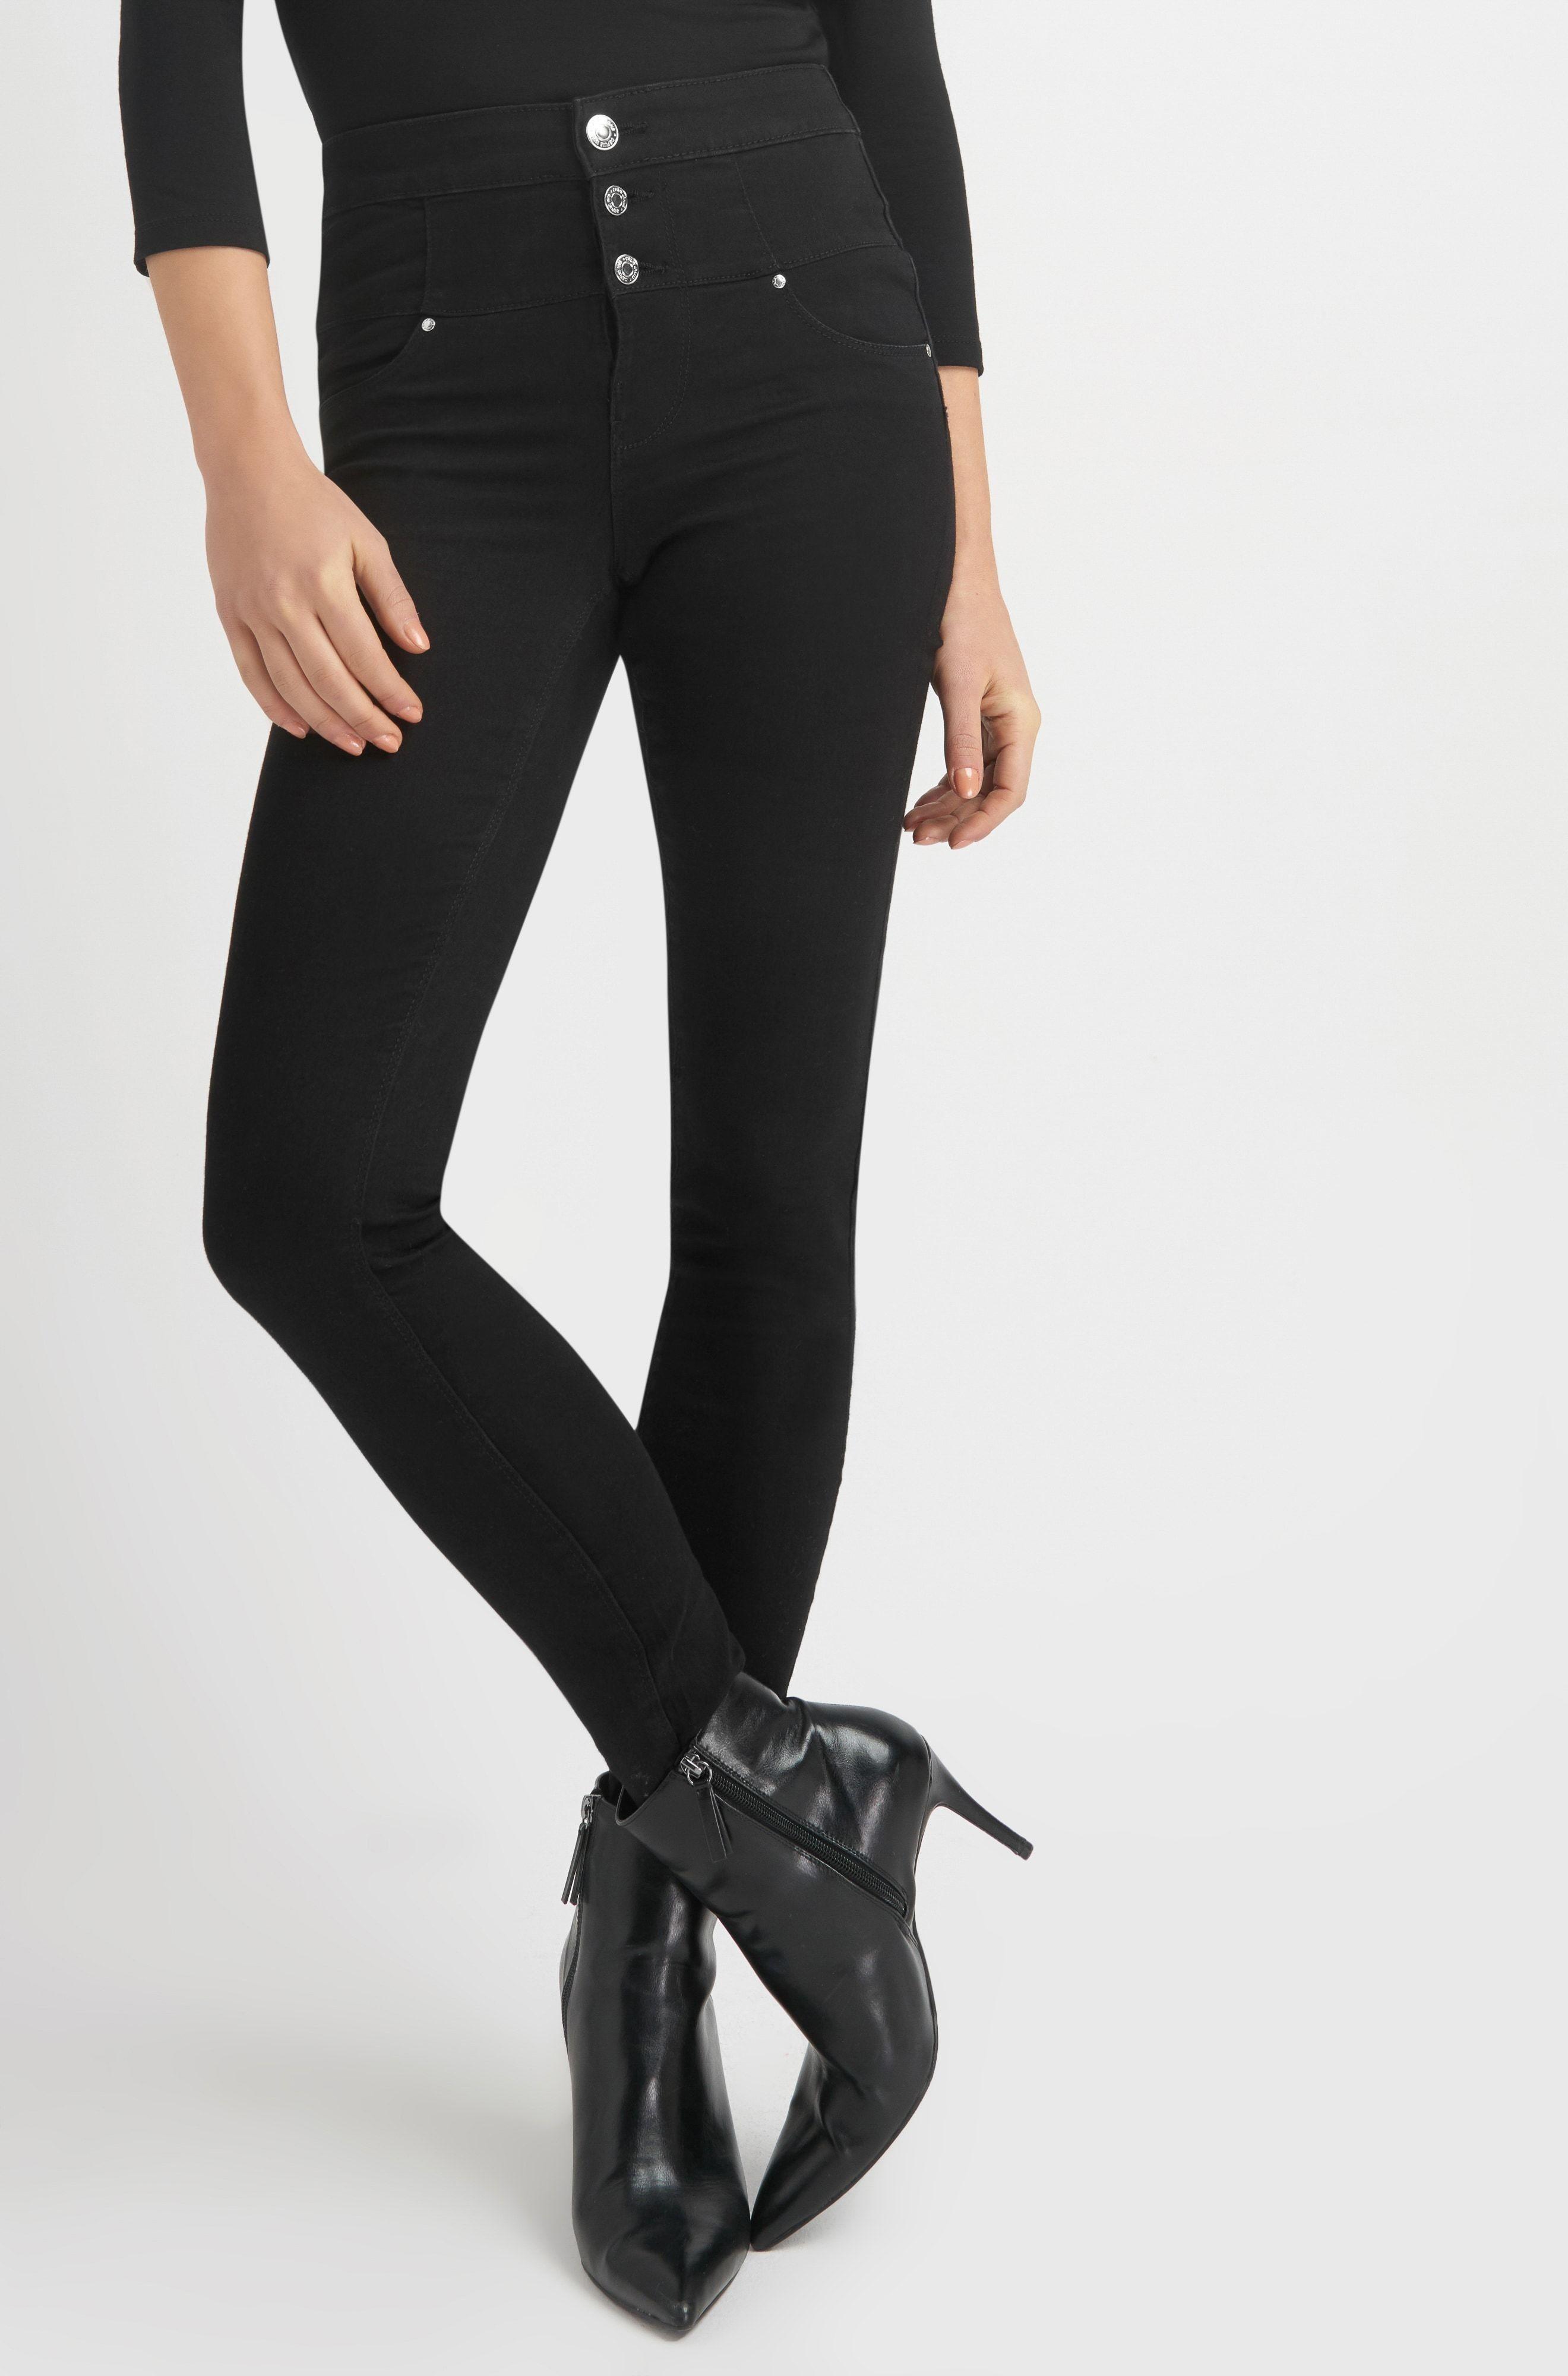 niedrigerer Preis mit Räumungspreise beste Schuhe ORSAY JEANS | Black high waist jeggings with buttons #mywork ...